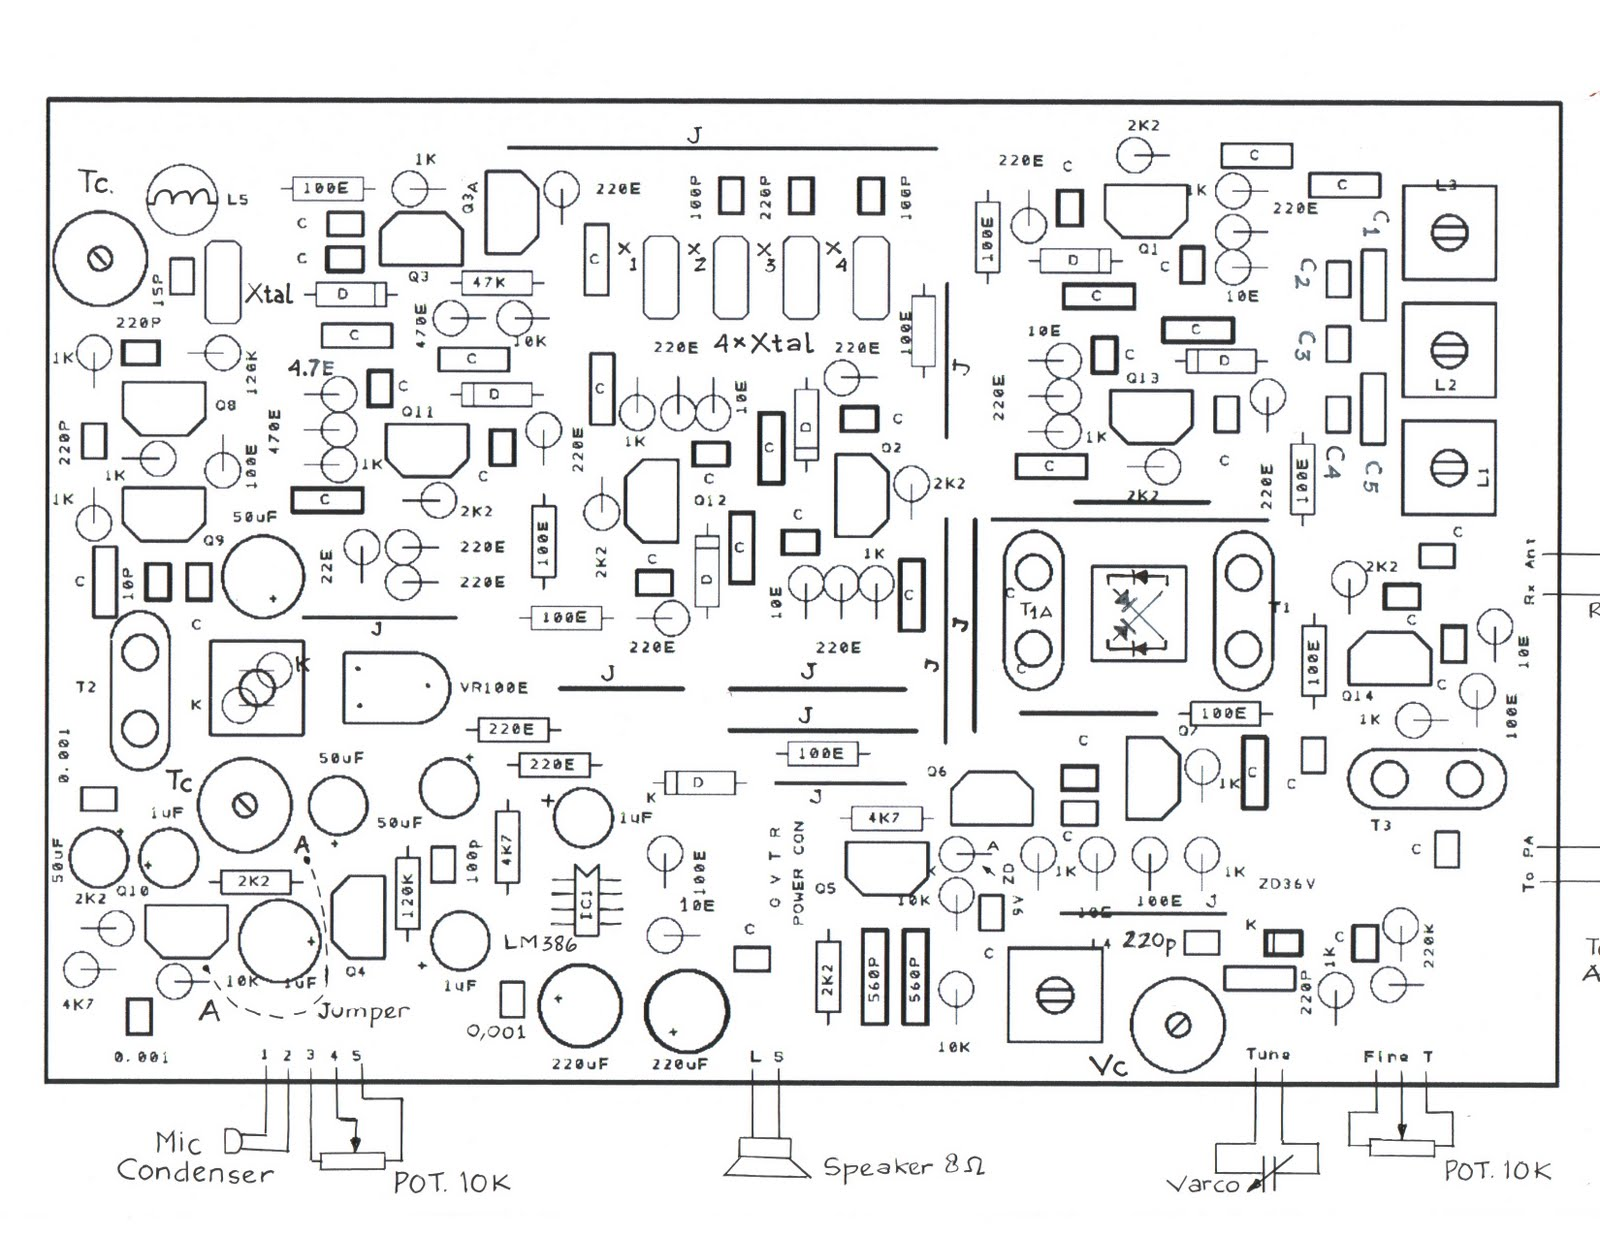 kenwood mobile audio wiring harness diagram  kenwood  free